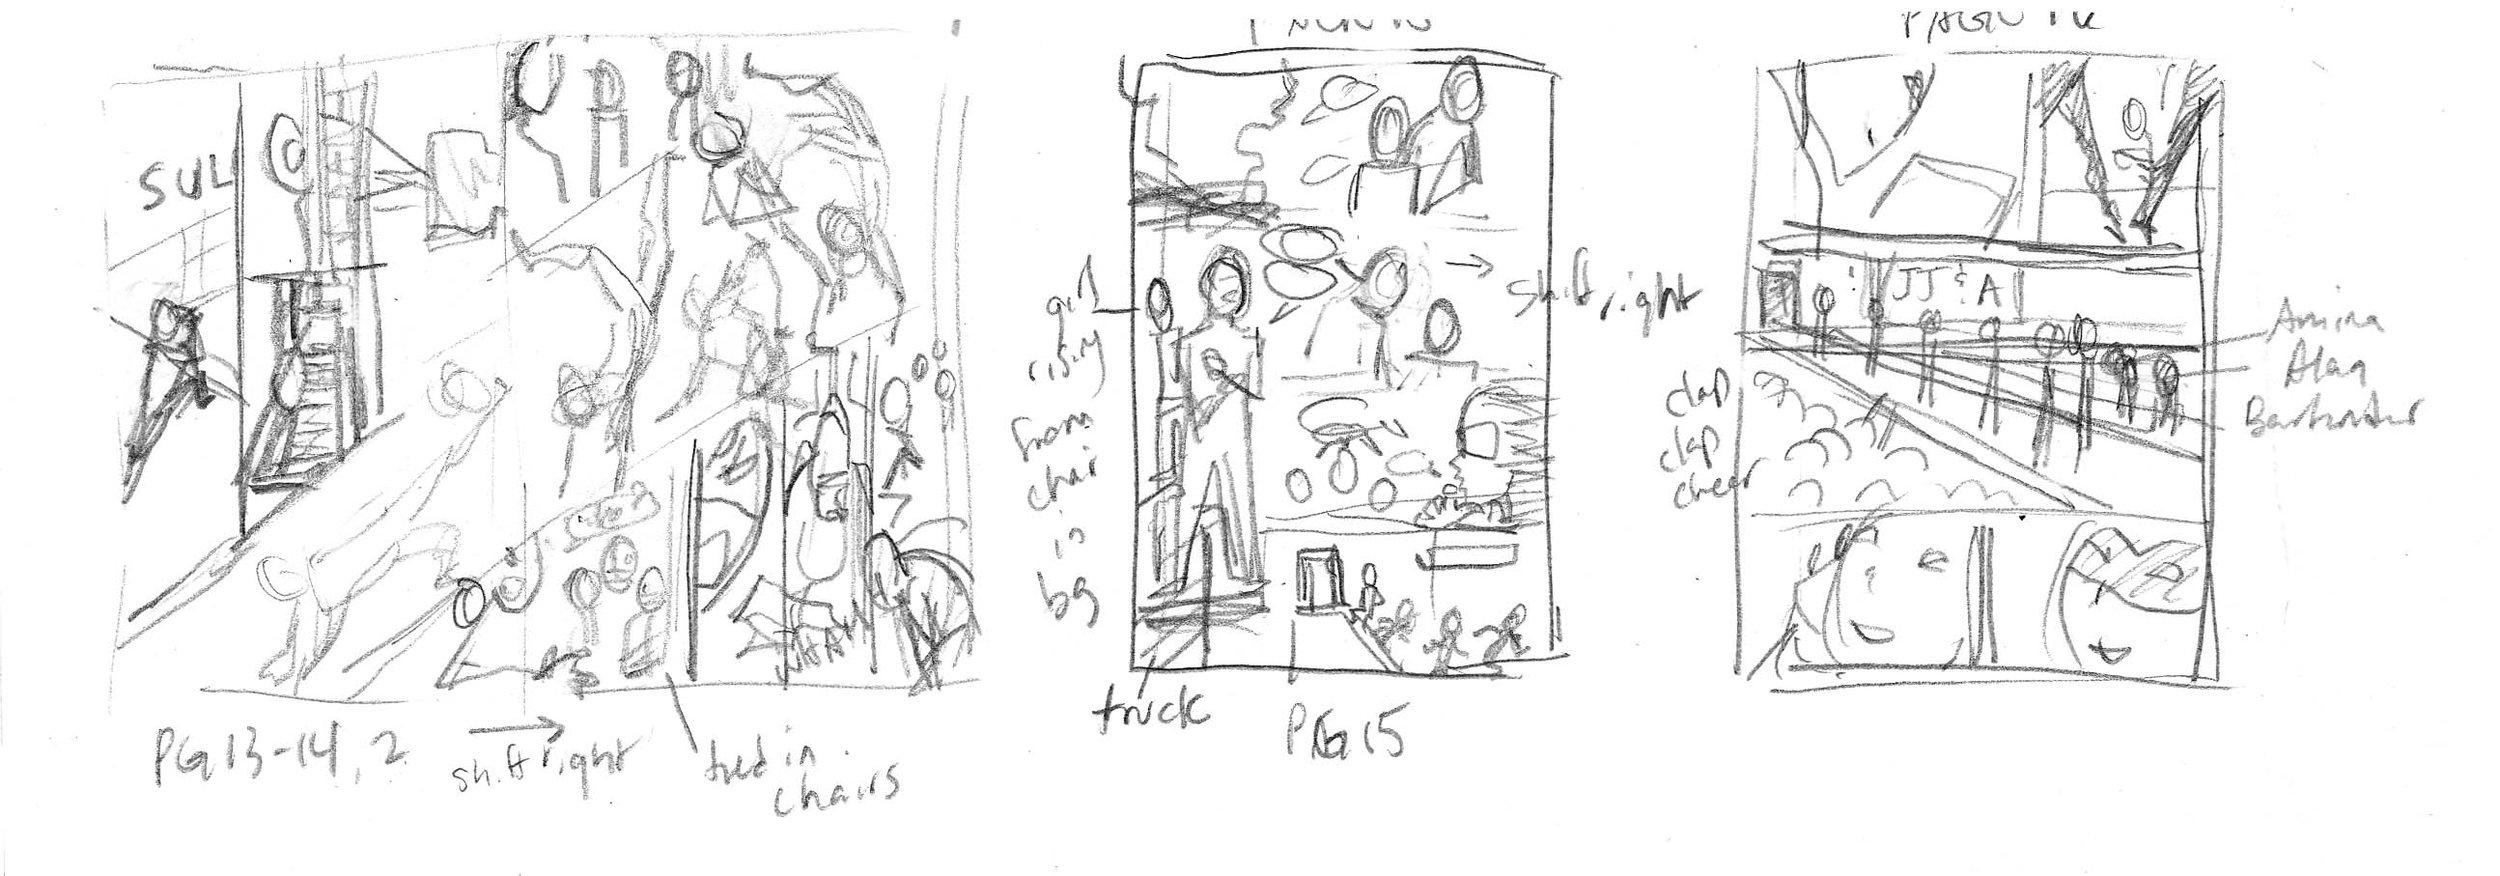 hunter haute_thumbnails sketch 3.jpg